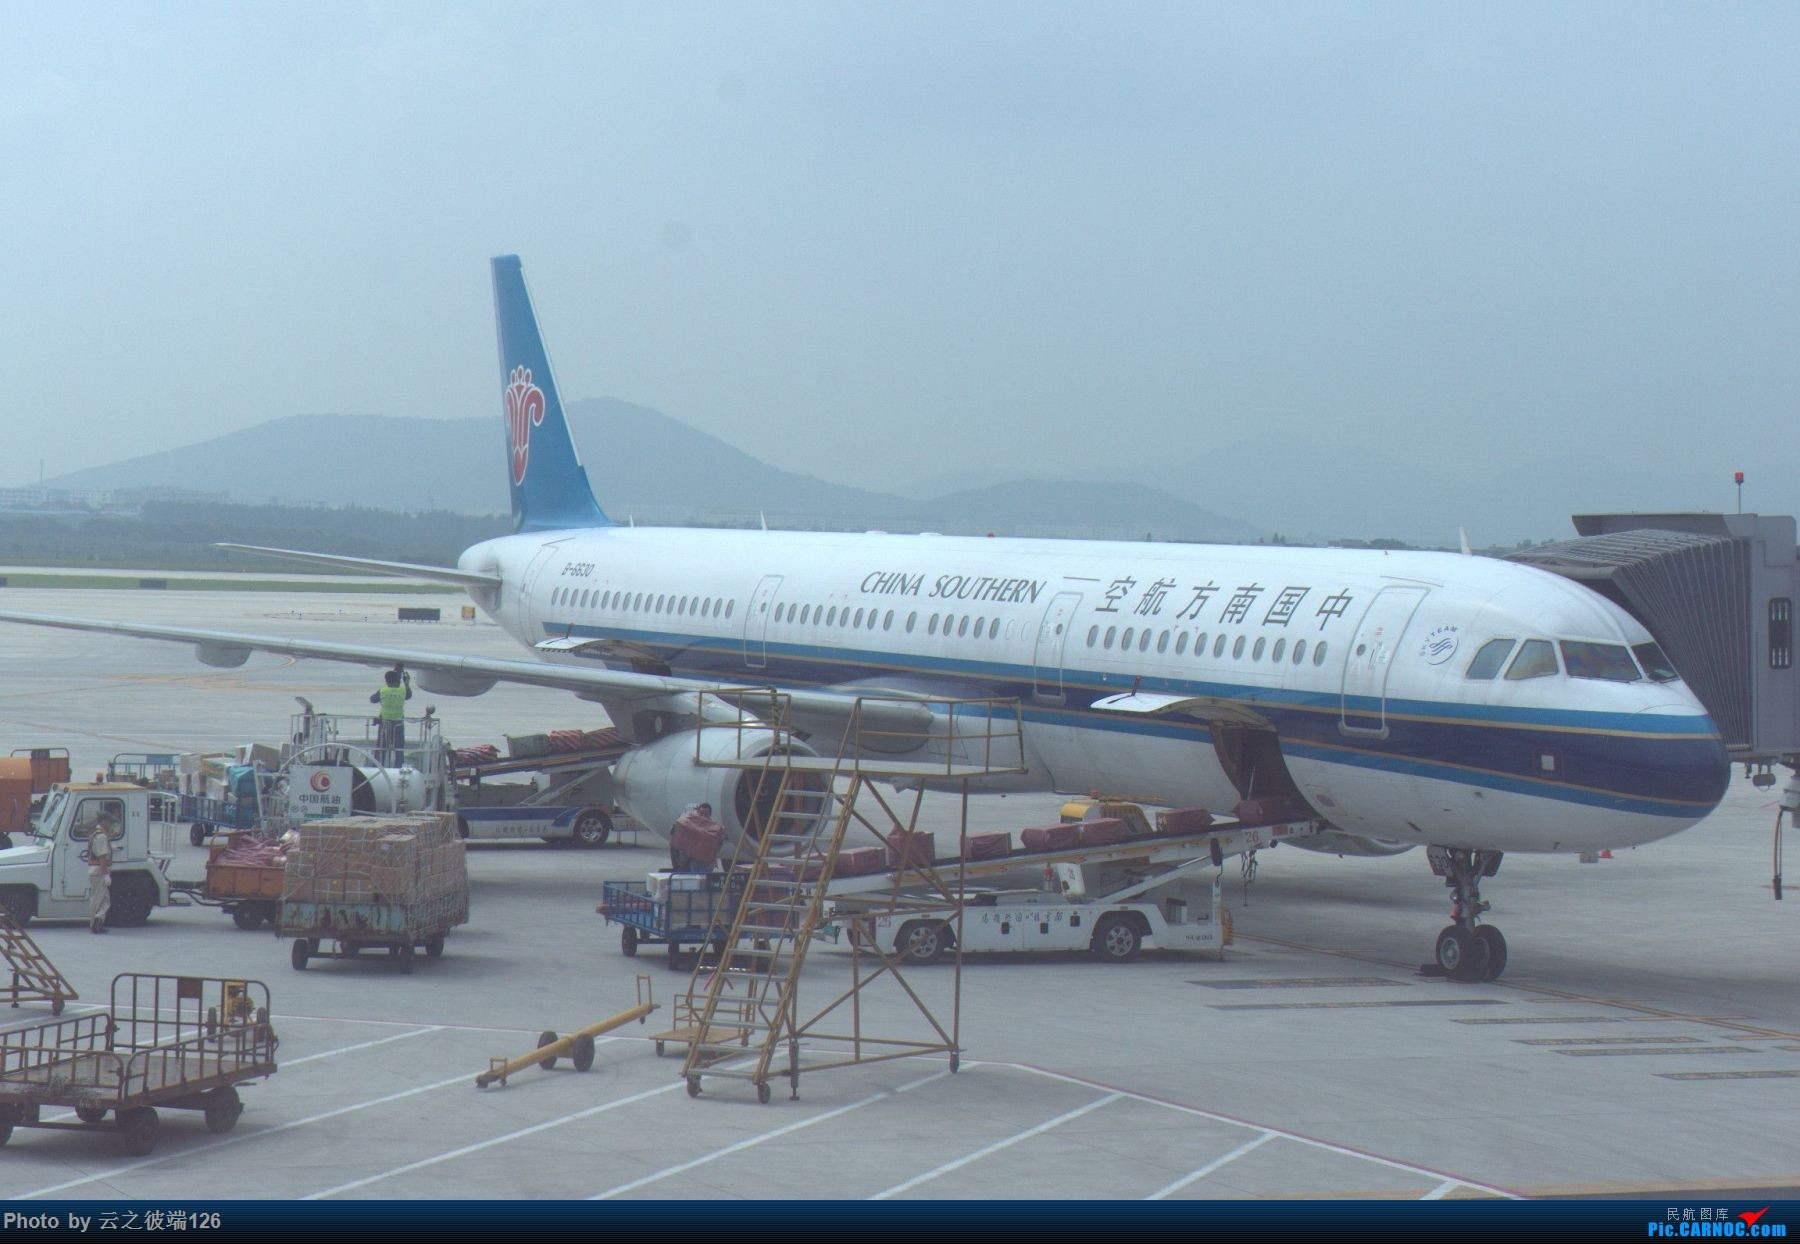 Re:[原创]迟到两年的游记 -----------NKG-SZX-NKG ZH+白菜航------ AIRBUS A321-200 B-6630 中国南京禄口国际机场